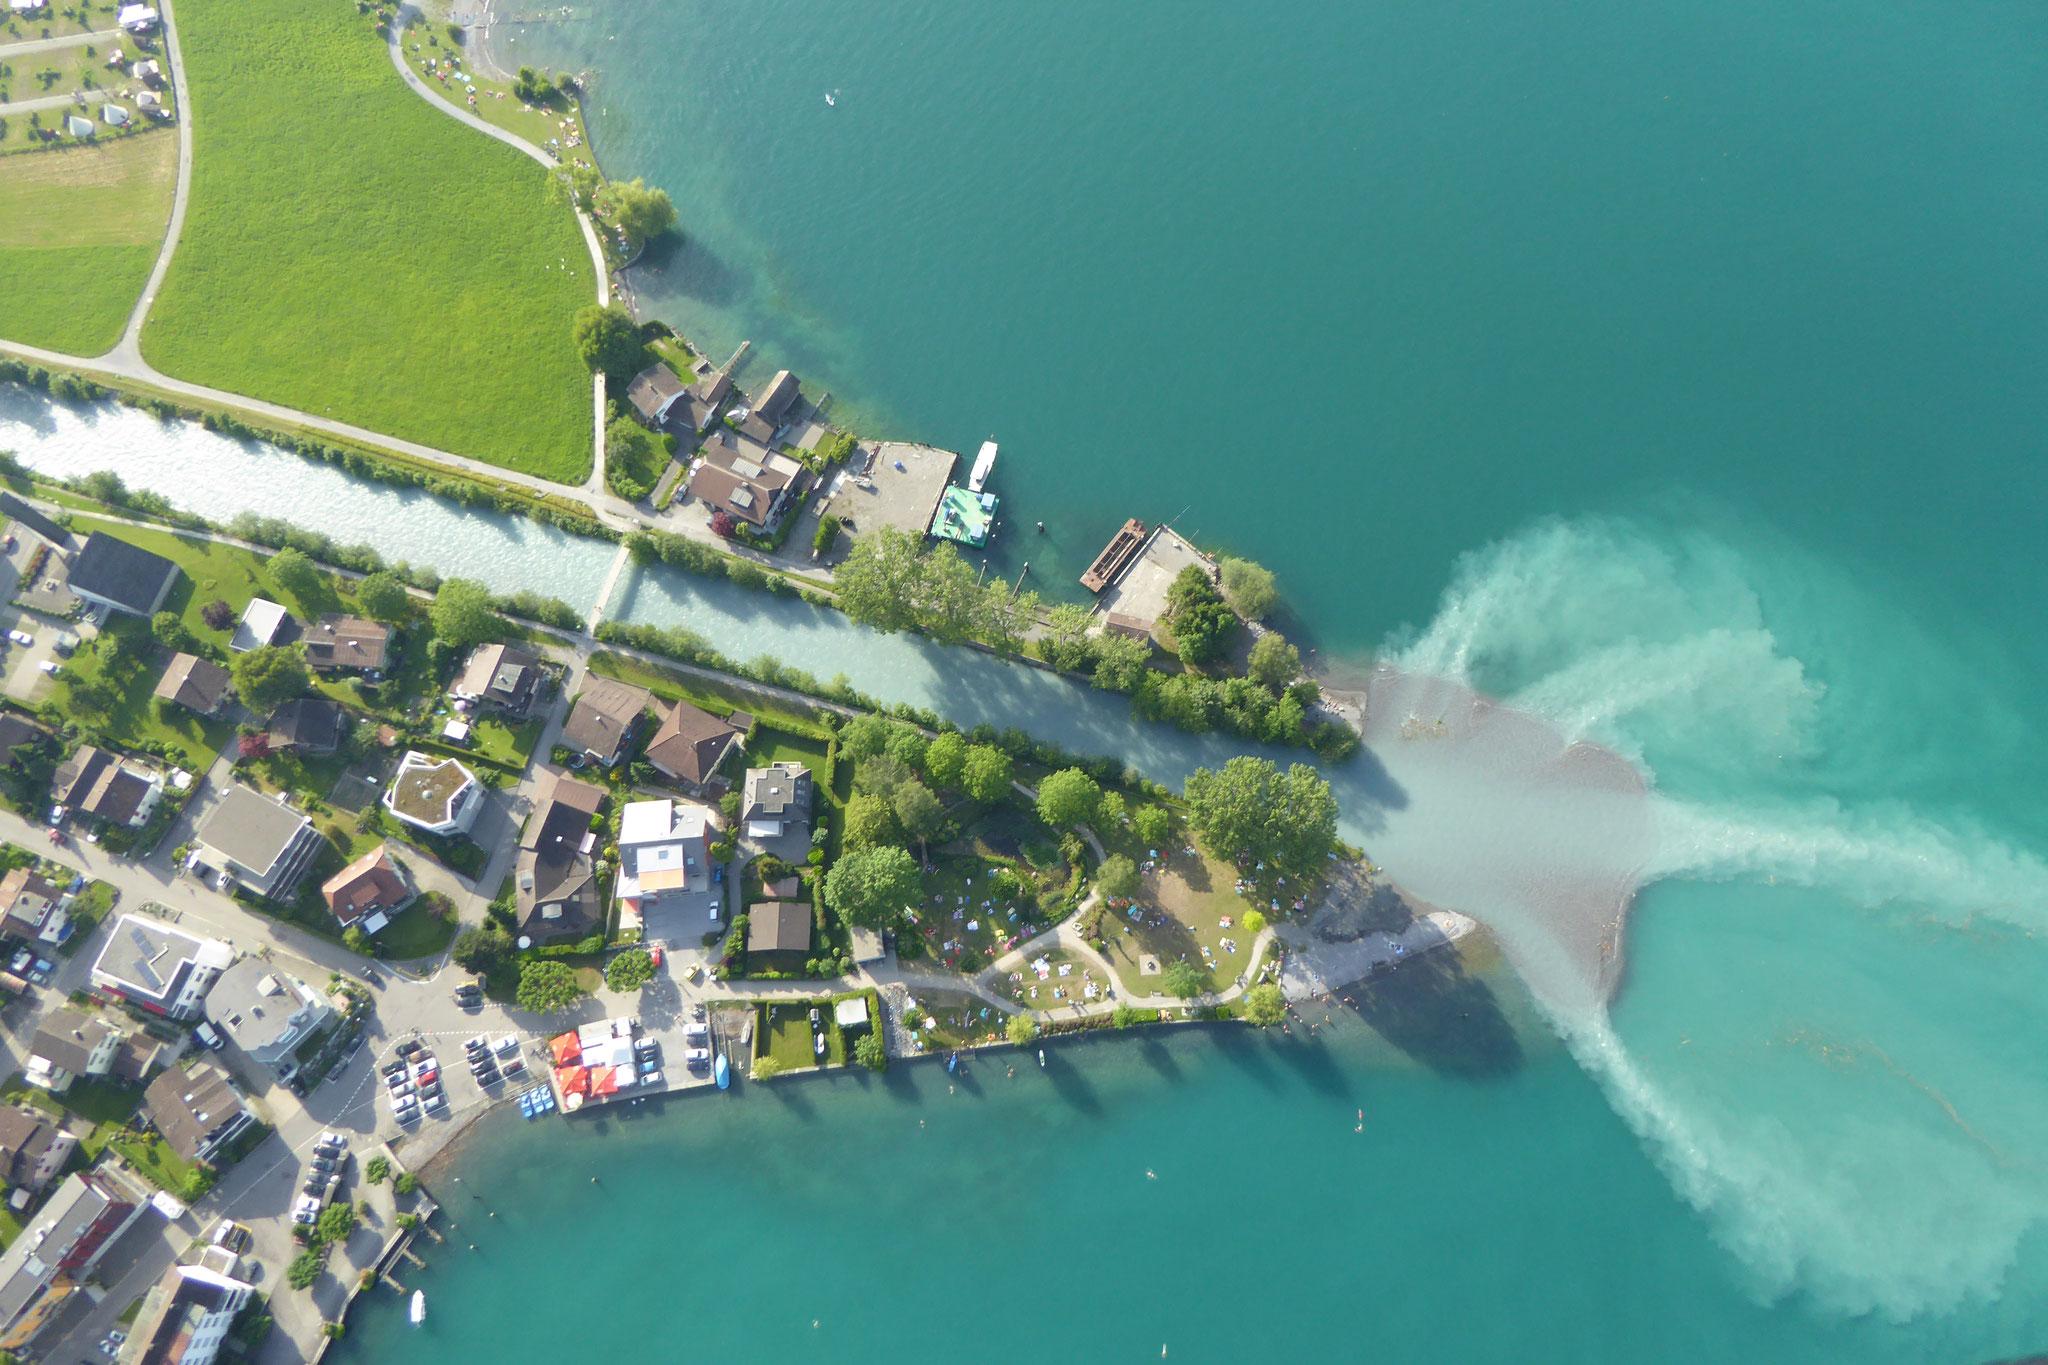 Badeflug mit Landung direkt am Badestrand